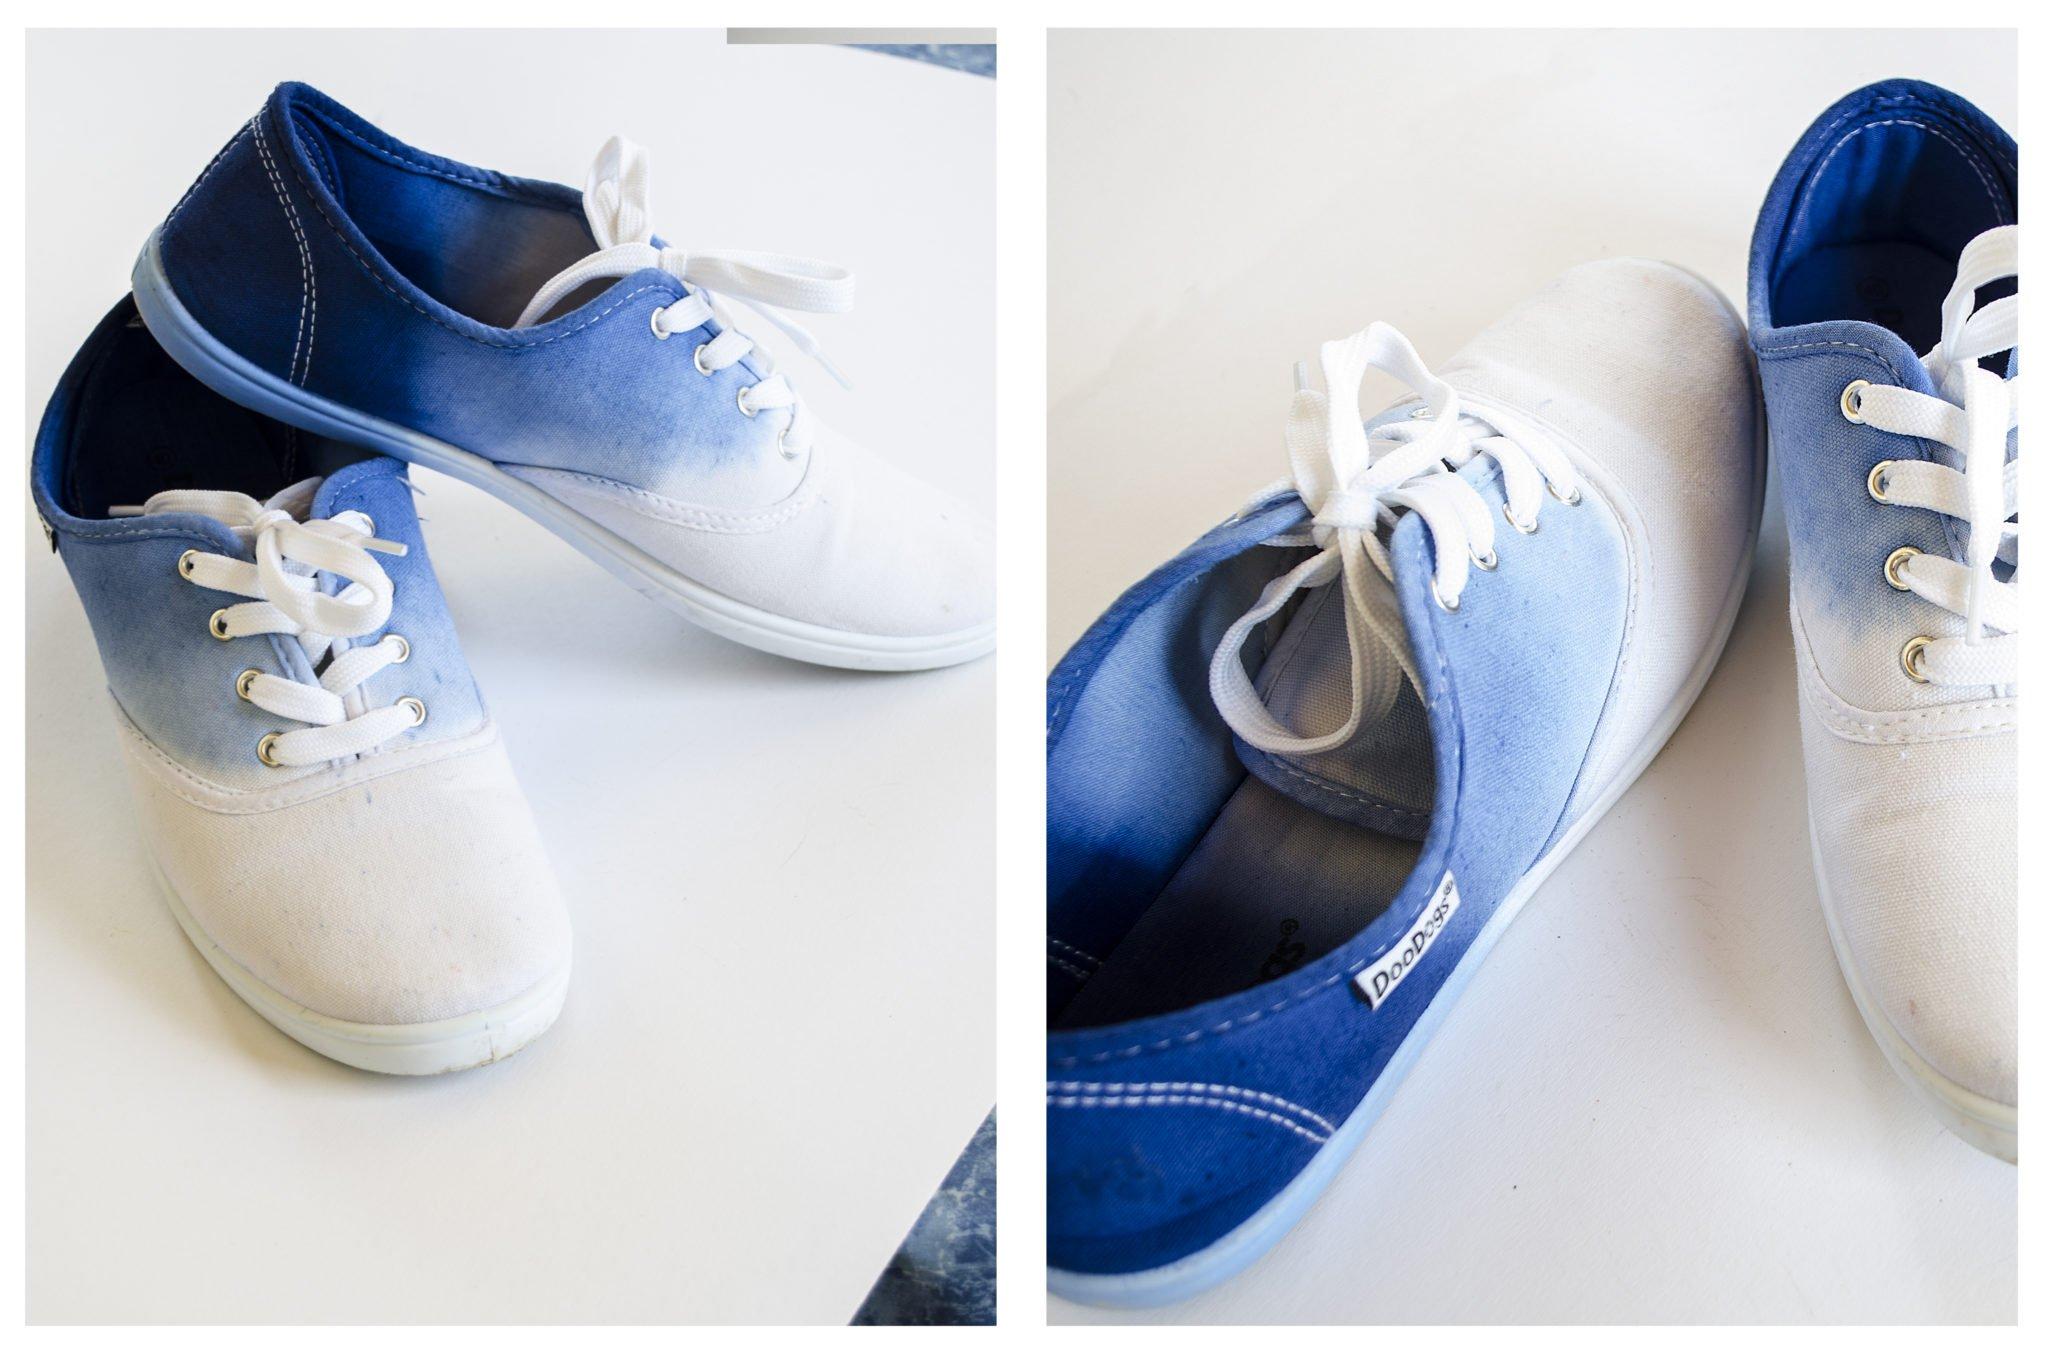 Dip- Dye -Schuhe in Blau